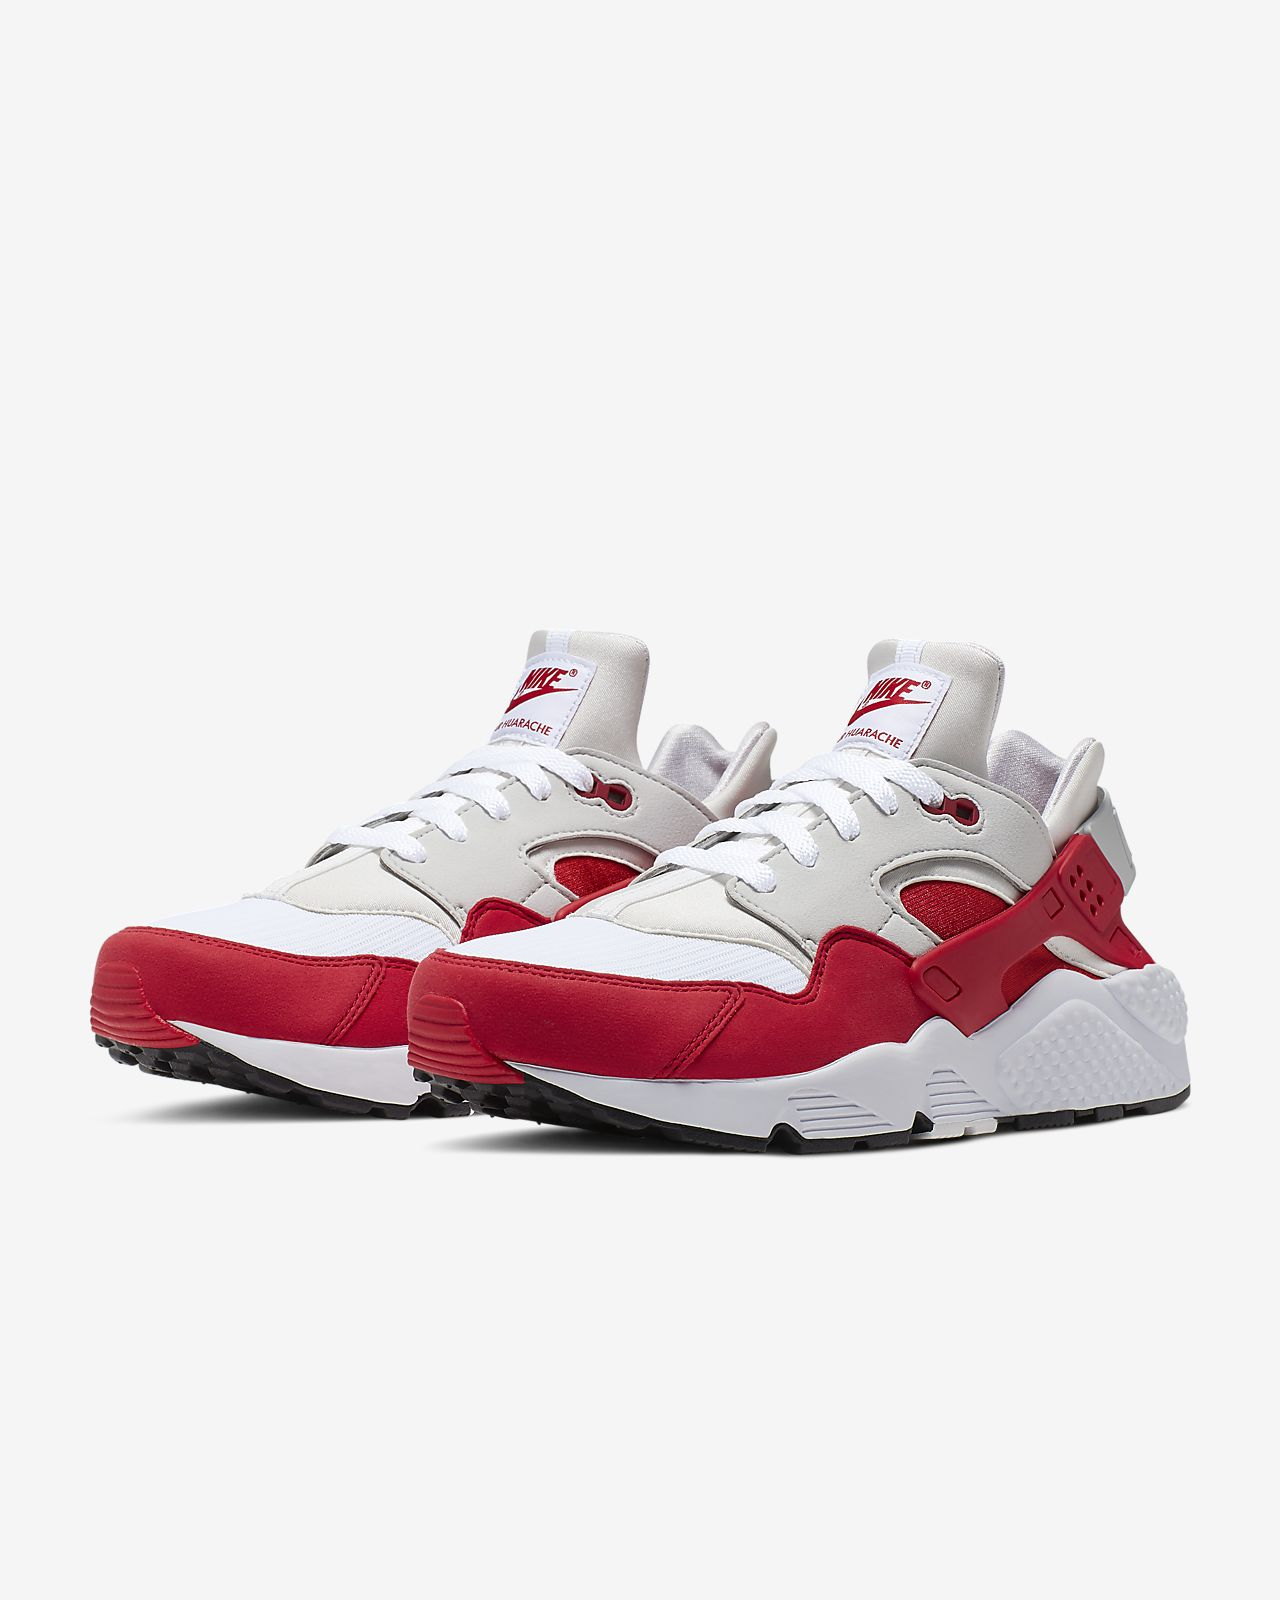 Calzado para hombre Nike Air Huarache Run DNA Ch. 1